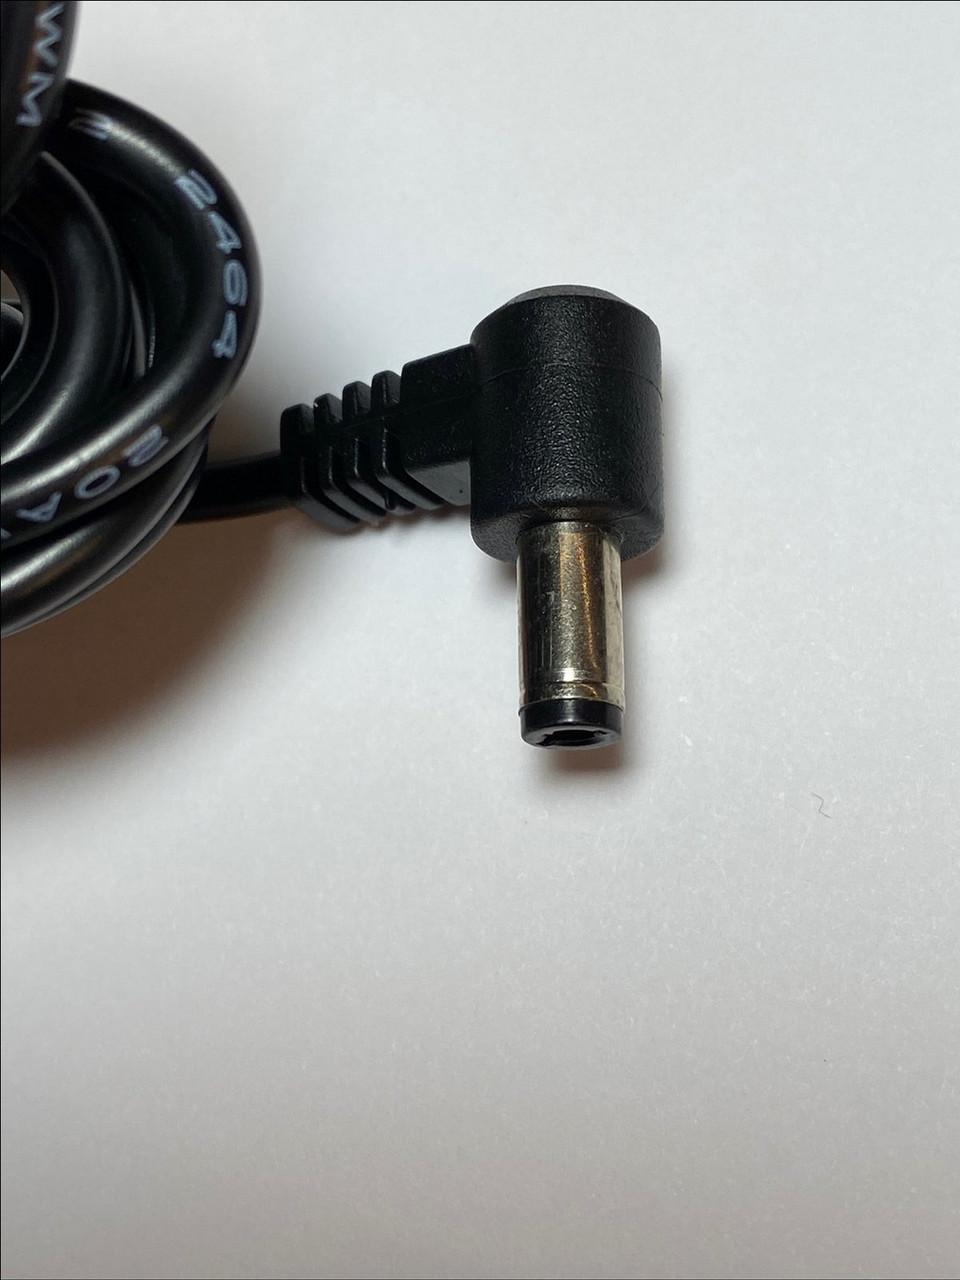 FYL AC Adapter for Yamaha PSR-210 PSR-540 PSR-630 Keyboard Power Supply Cord